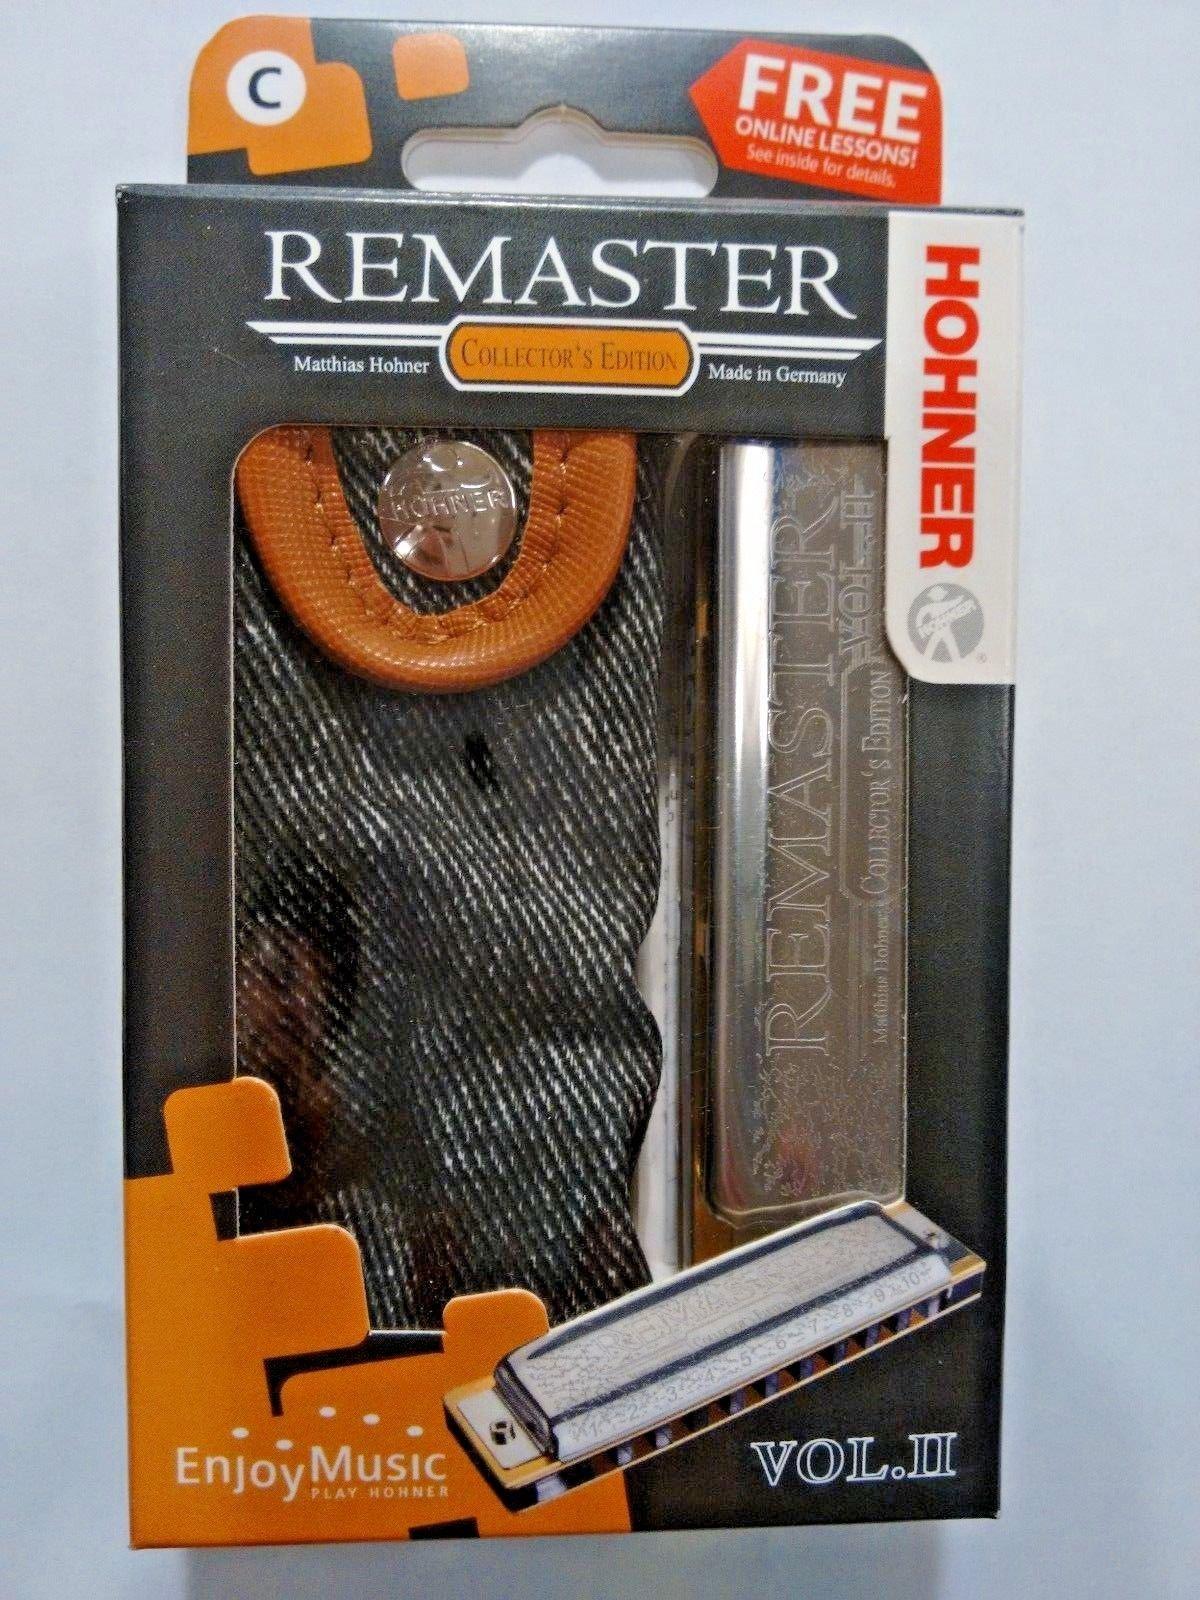 New Hohner Remaster Vol.II Harmonica